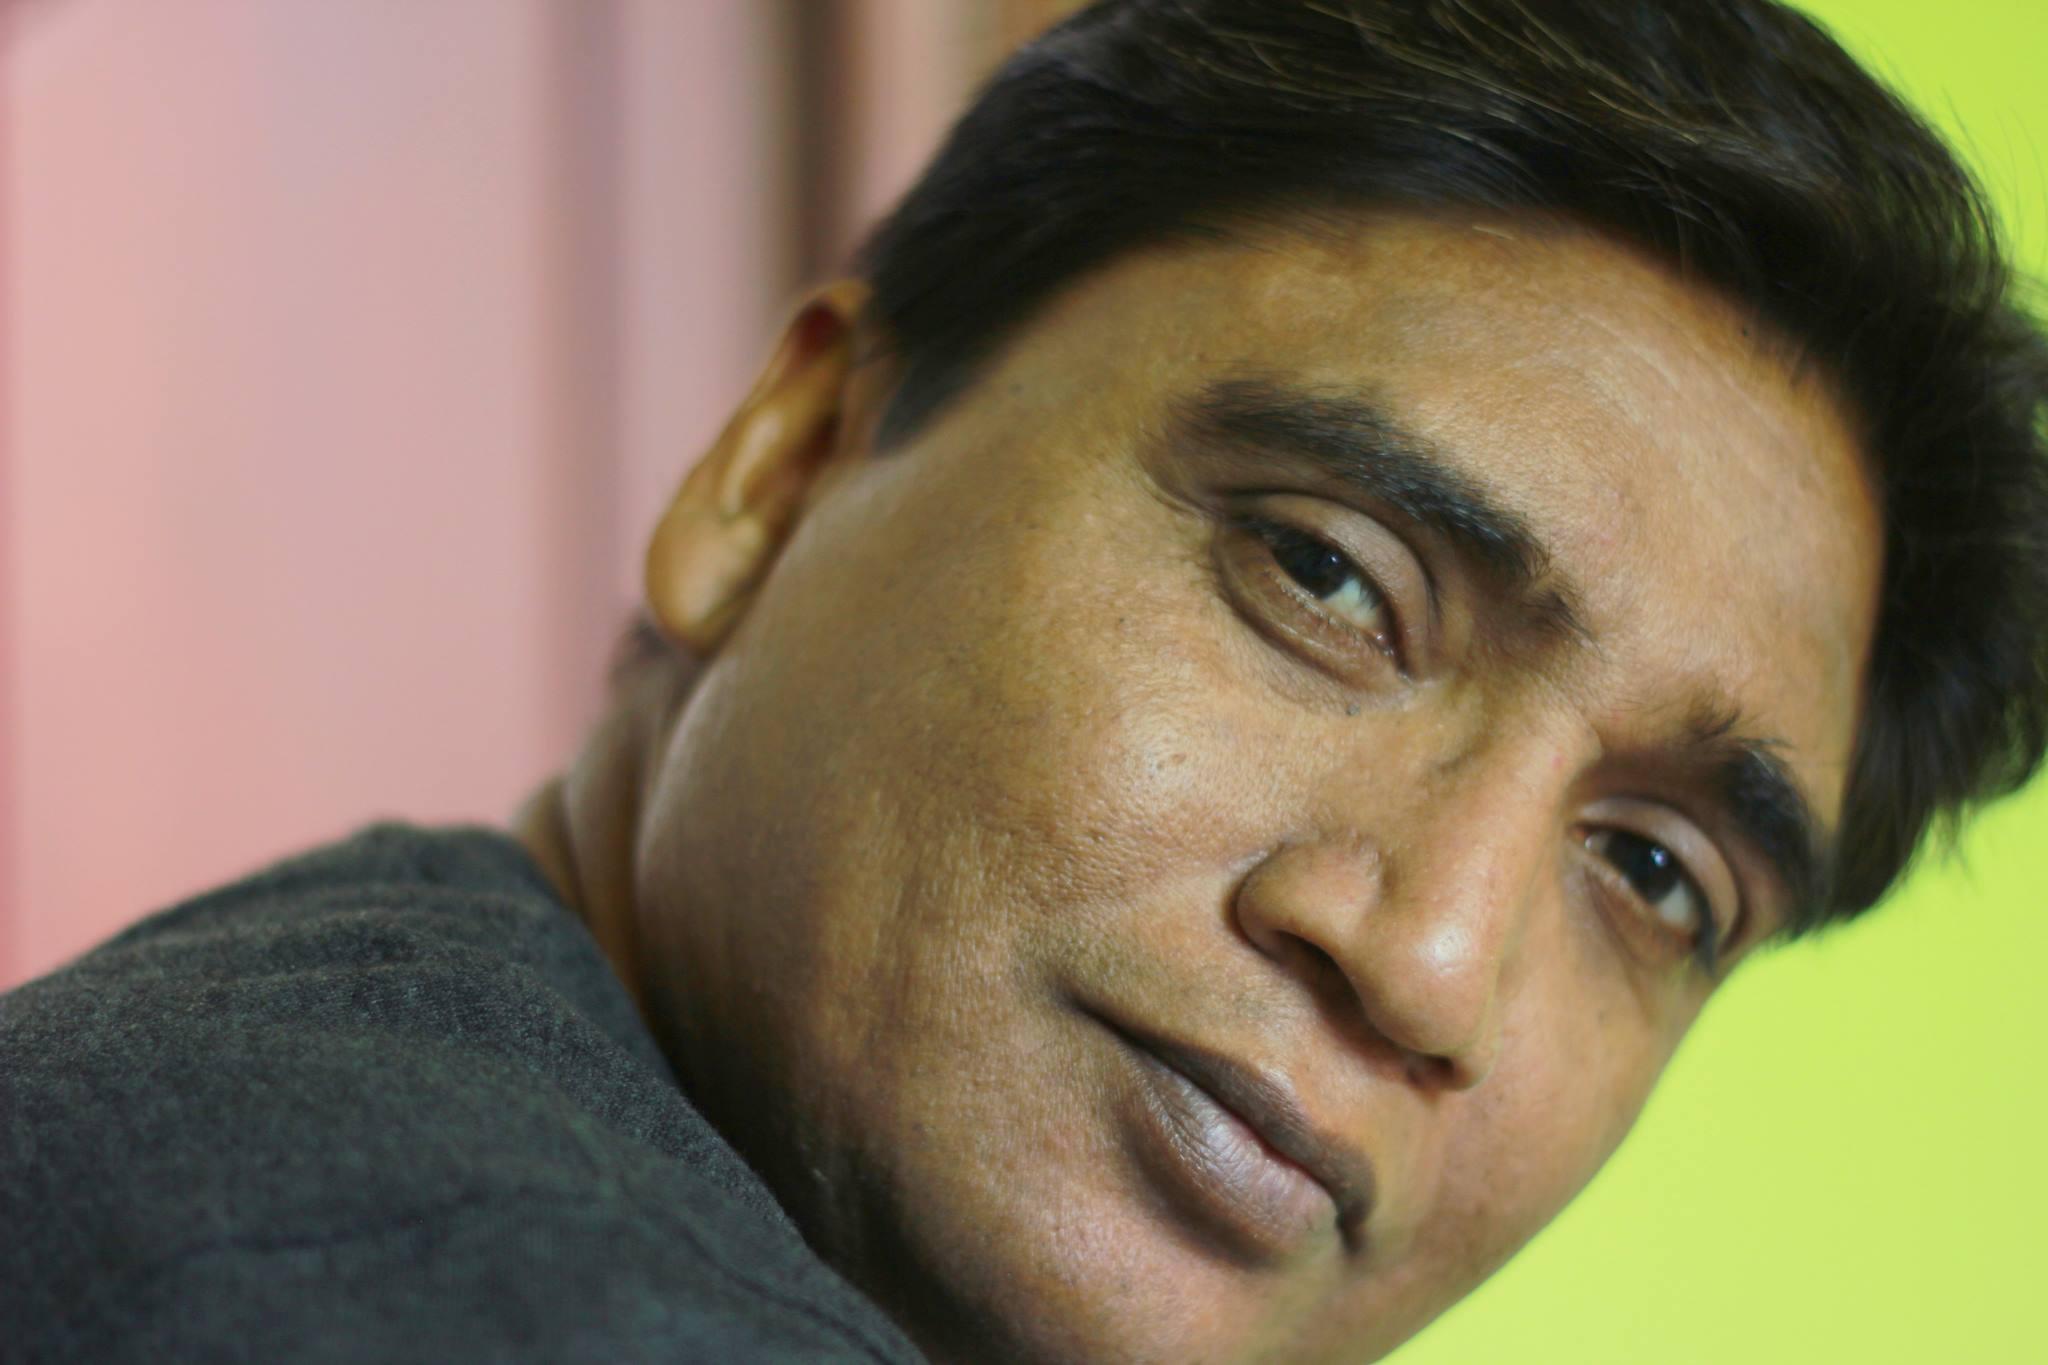 Jeetendra chaudhary